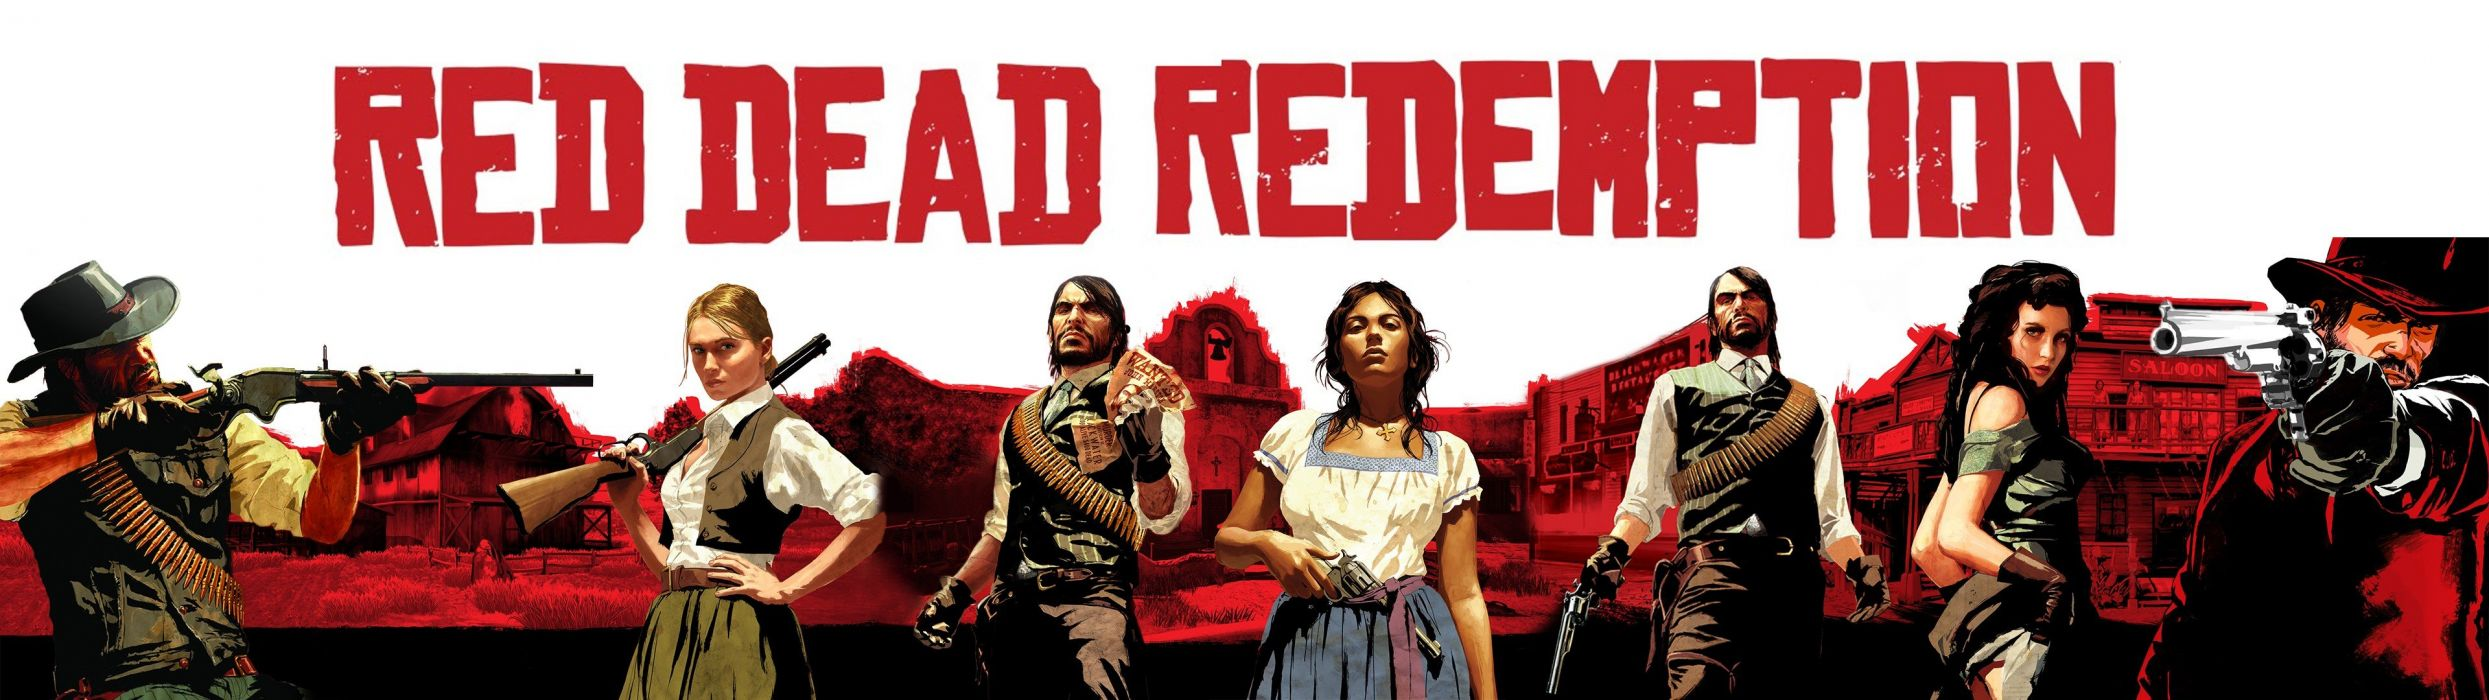 RED DEAD REDEMPTION western action adventure (64) wallpaper